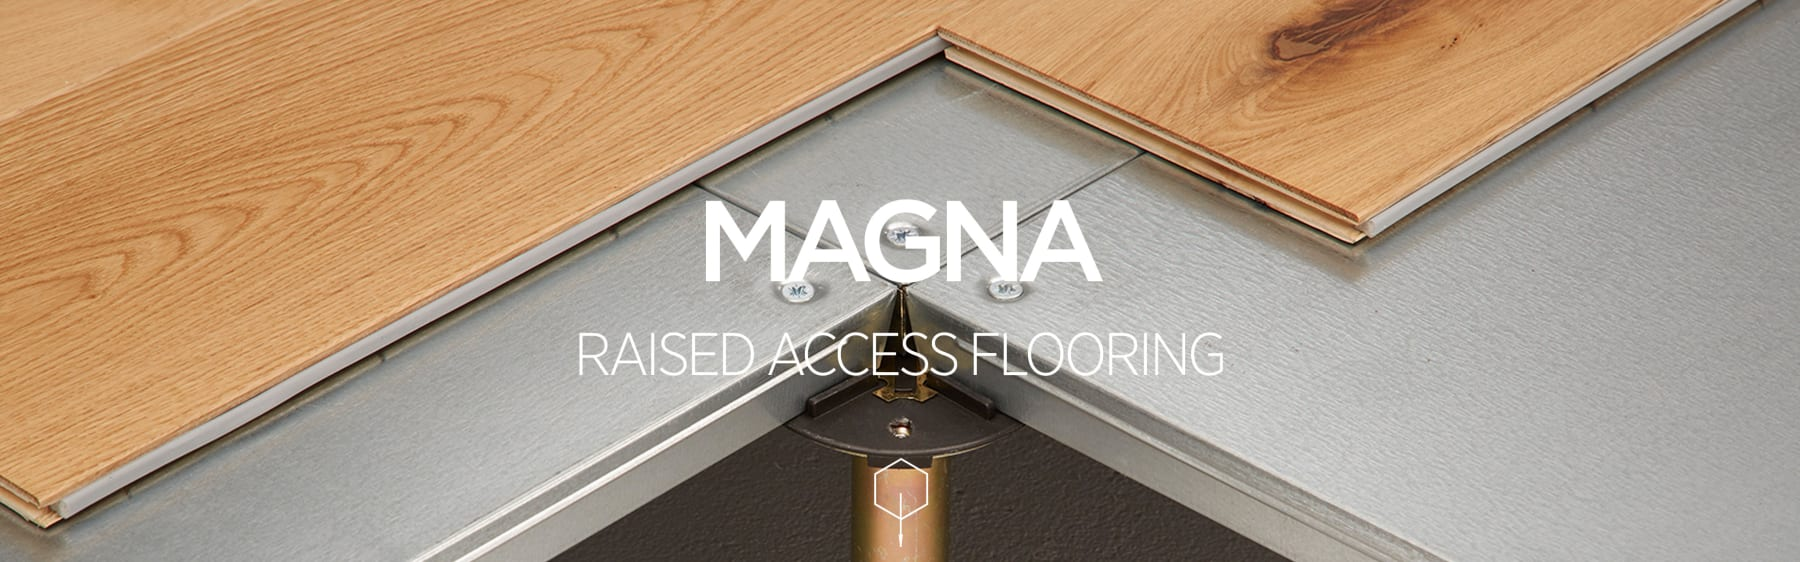 Magna Title Header